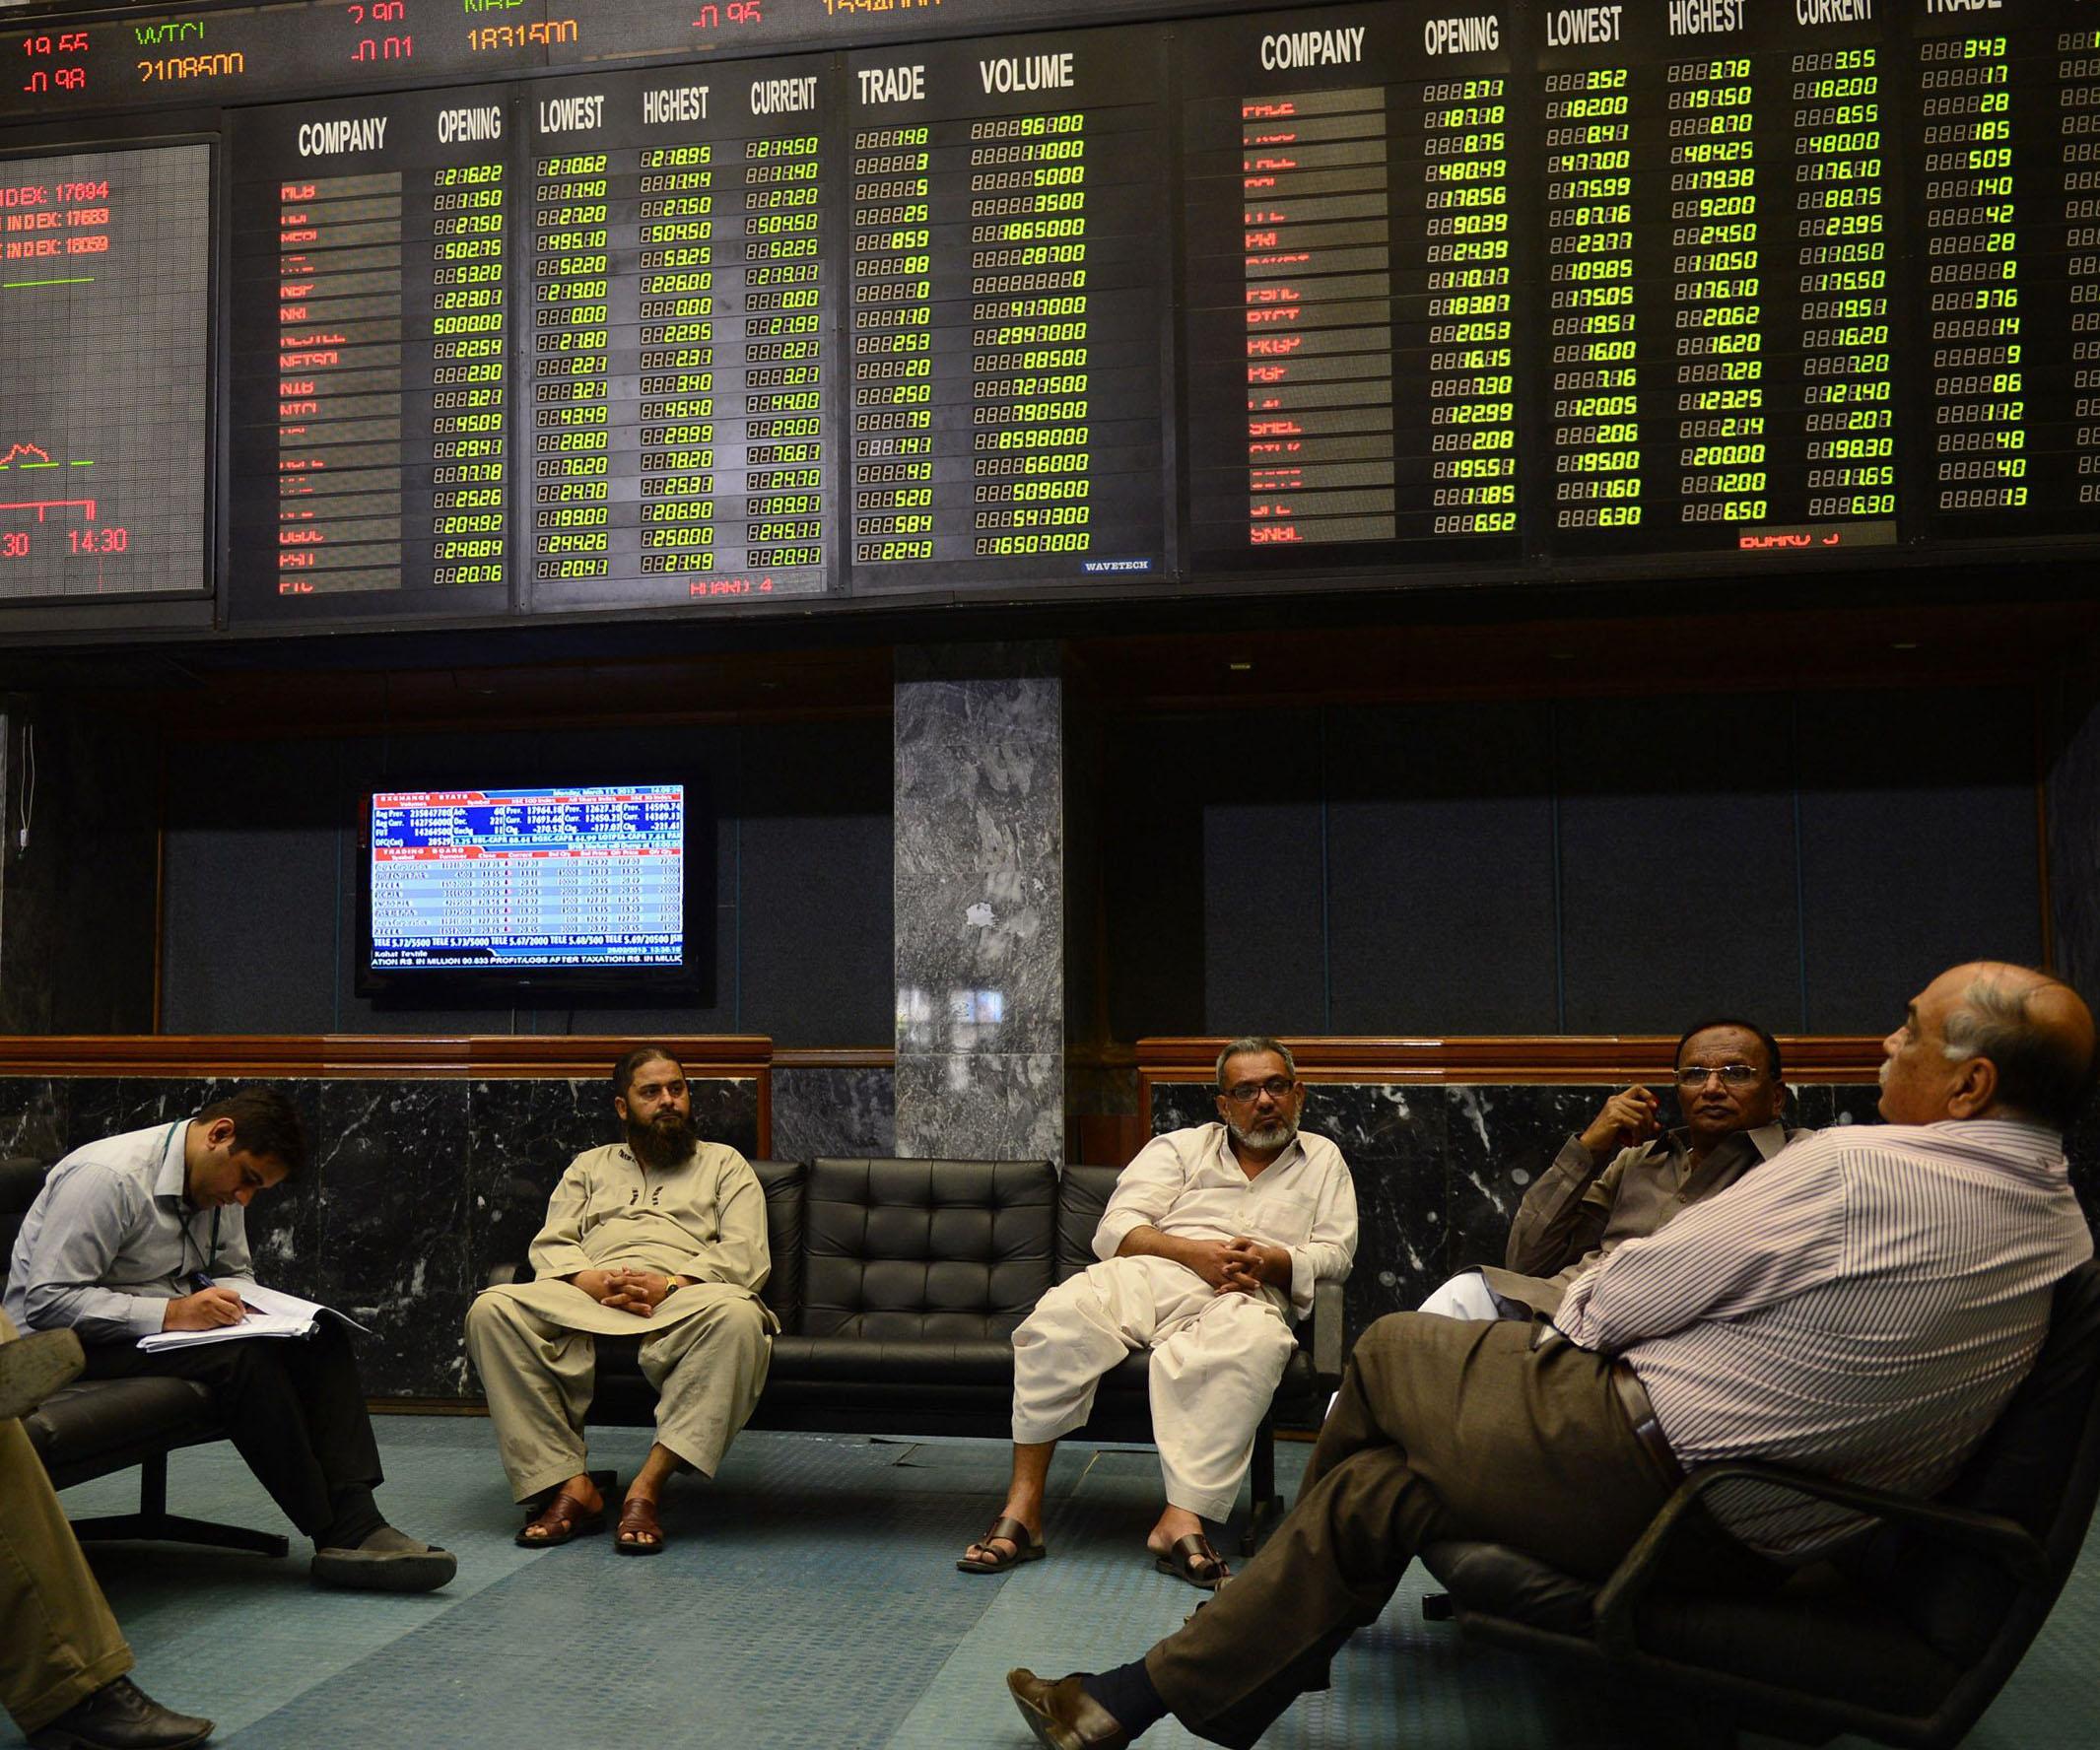 amid upheaval rs857b wiped off pakistan s stock market